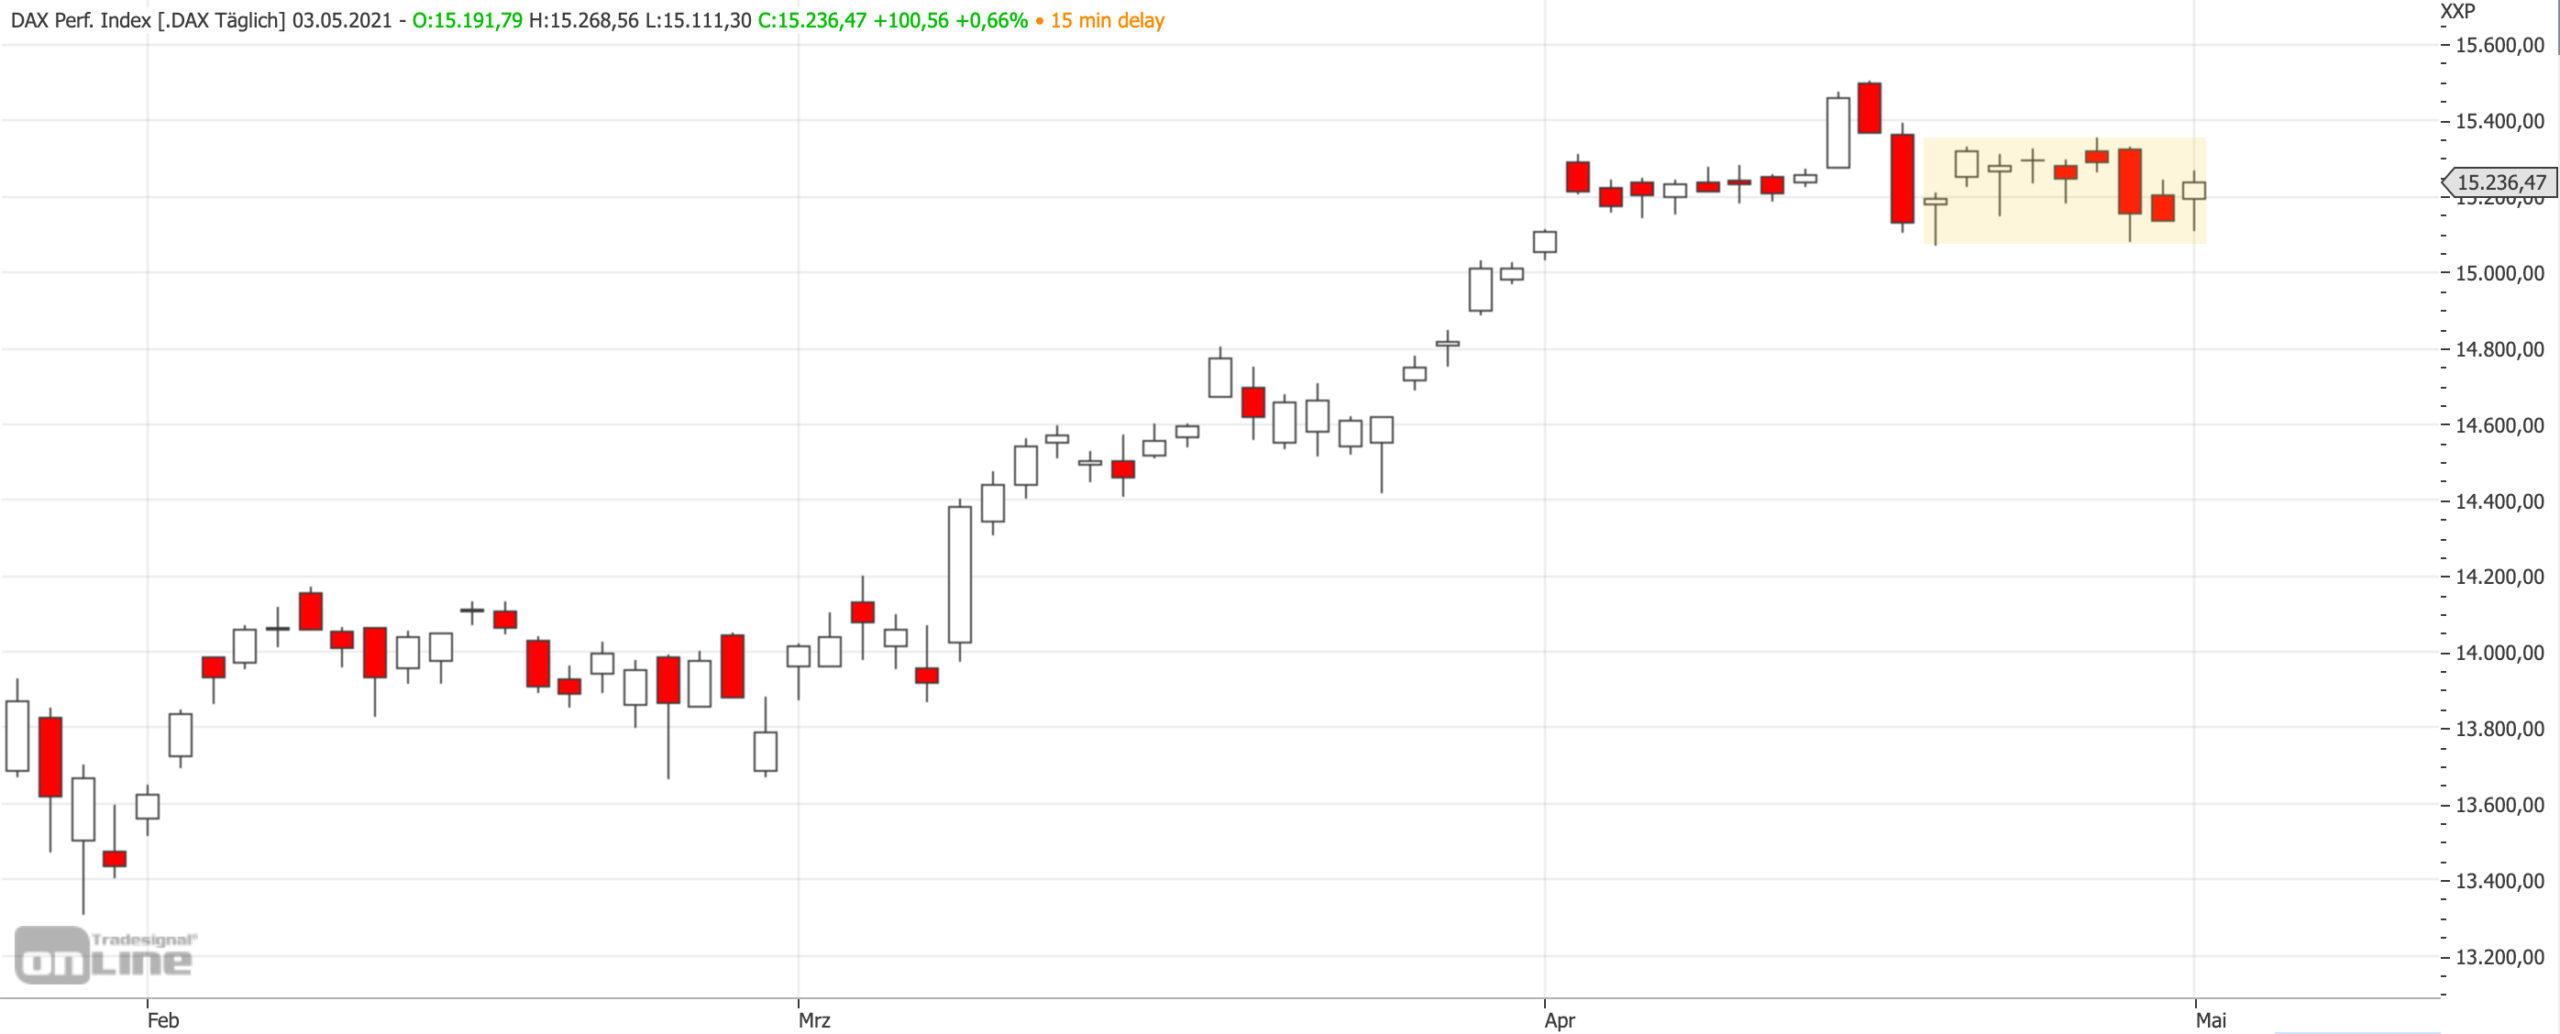 Mittelfristiger DAX-Chart am 03.05.2021